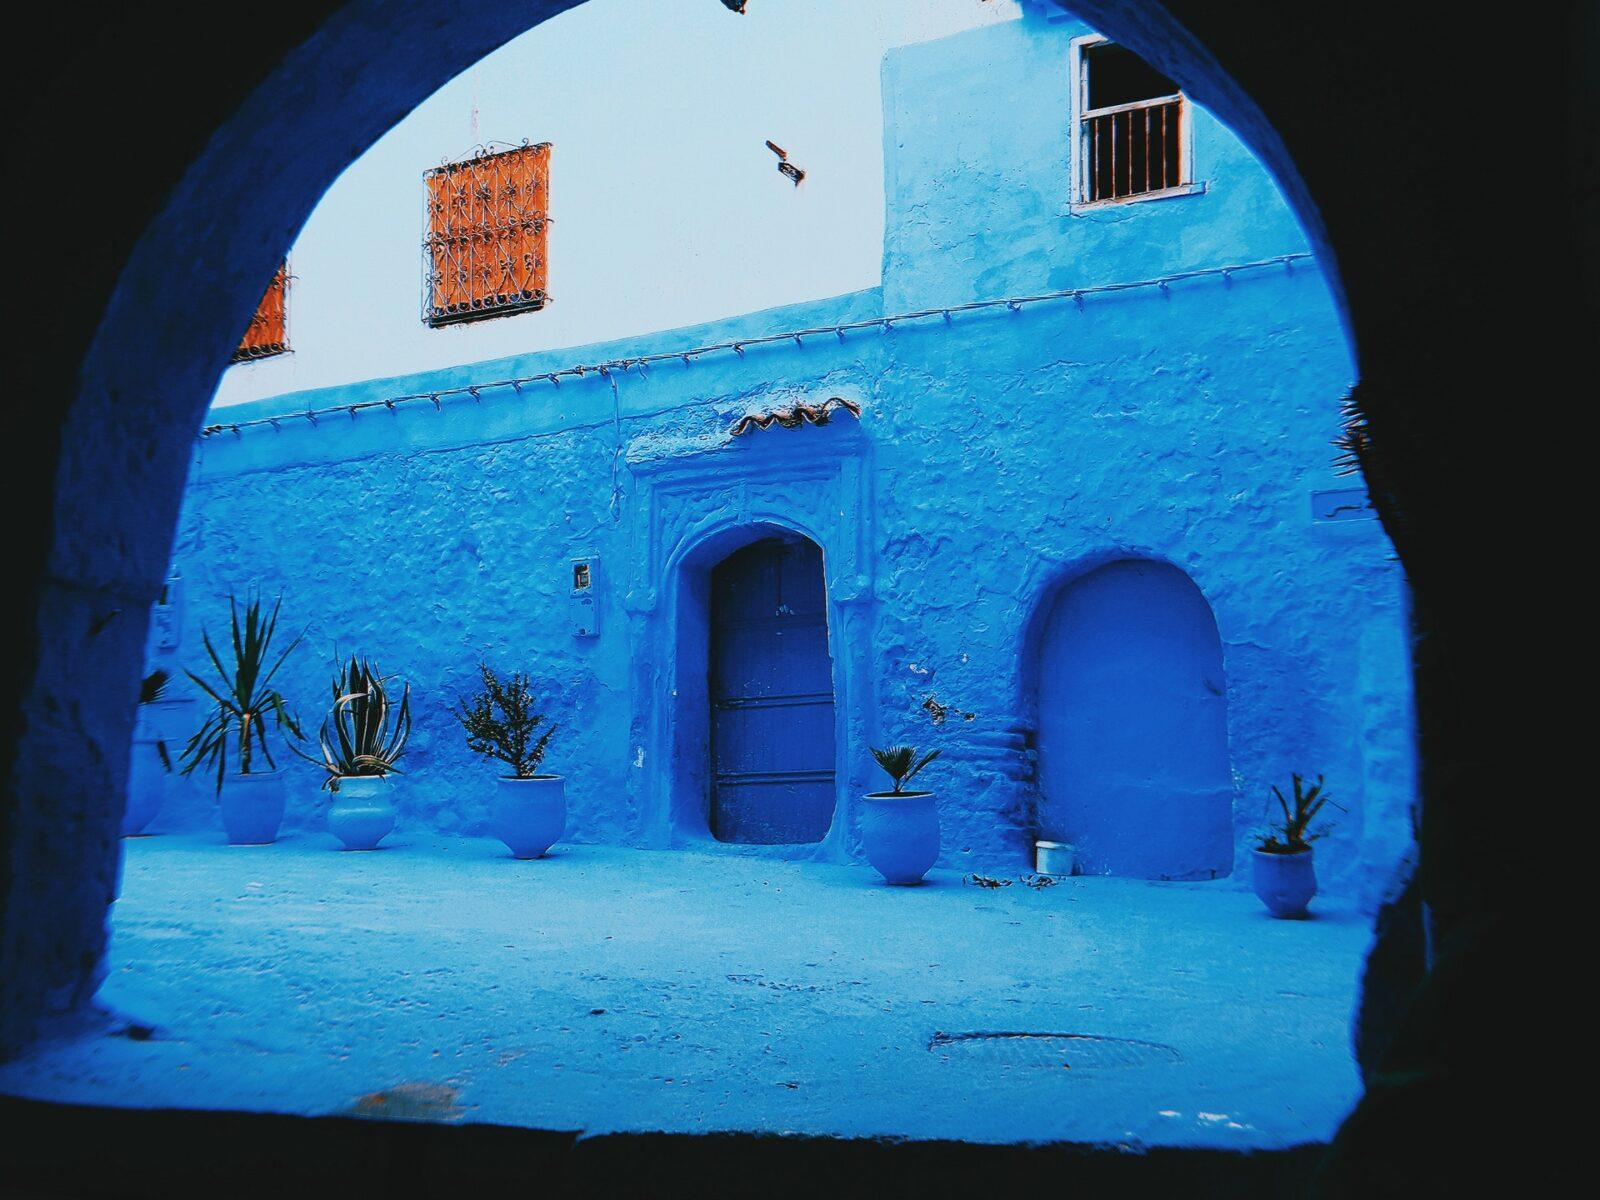 pexels samir jammal 2215787 1536x1152 - Guide Morocco Tours